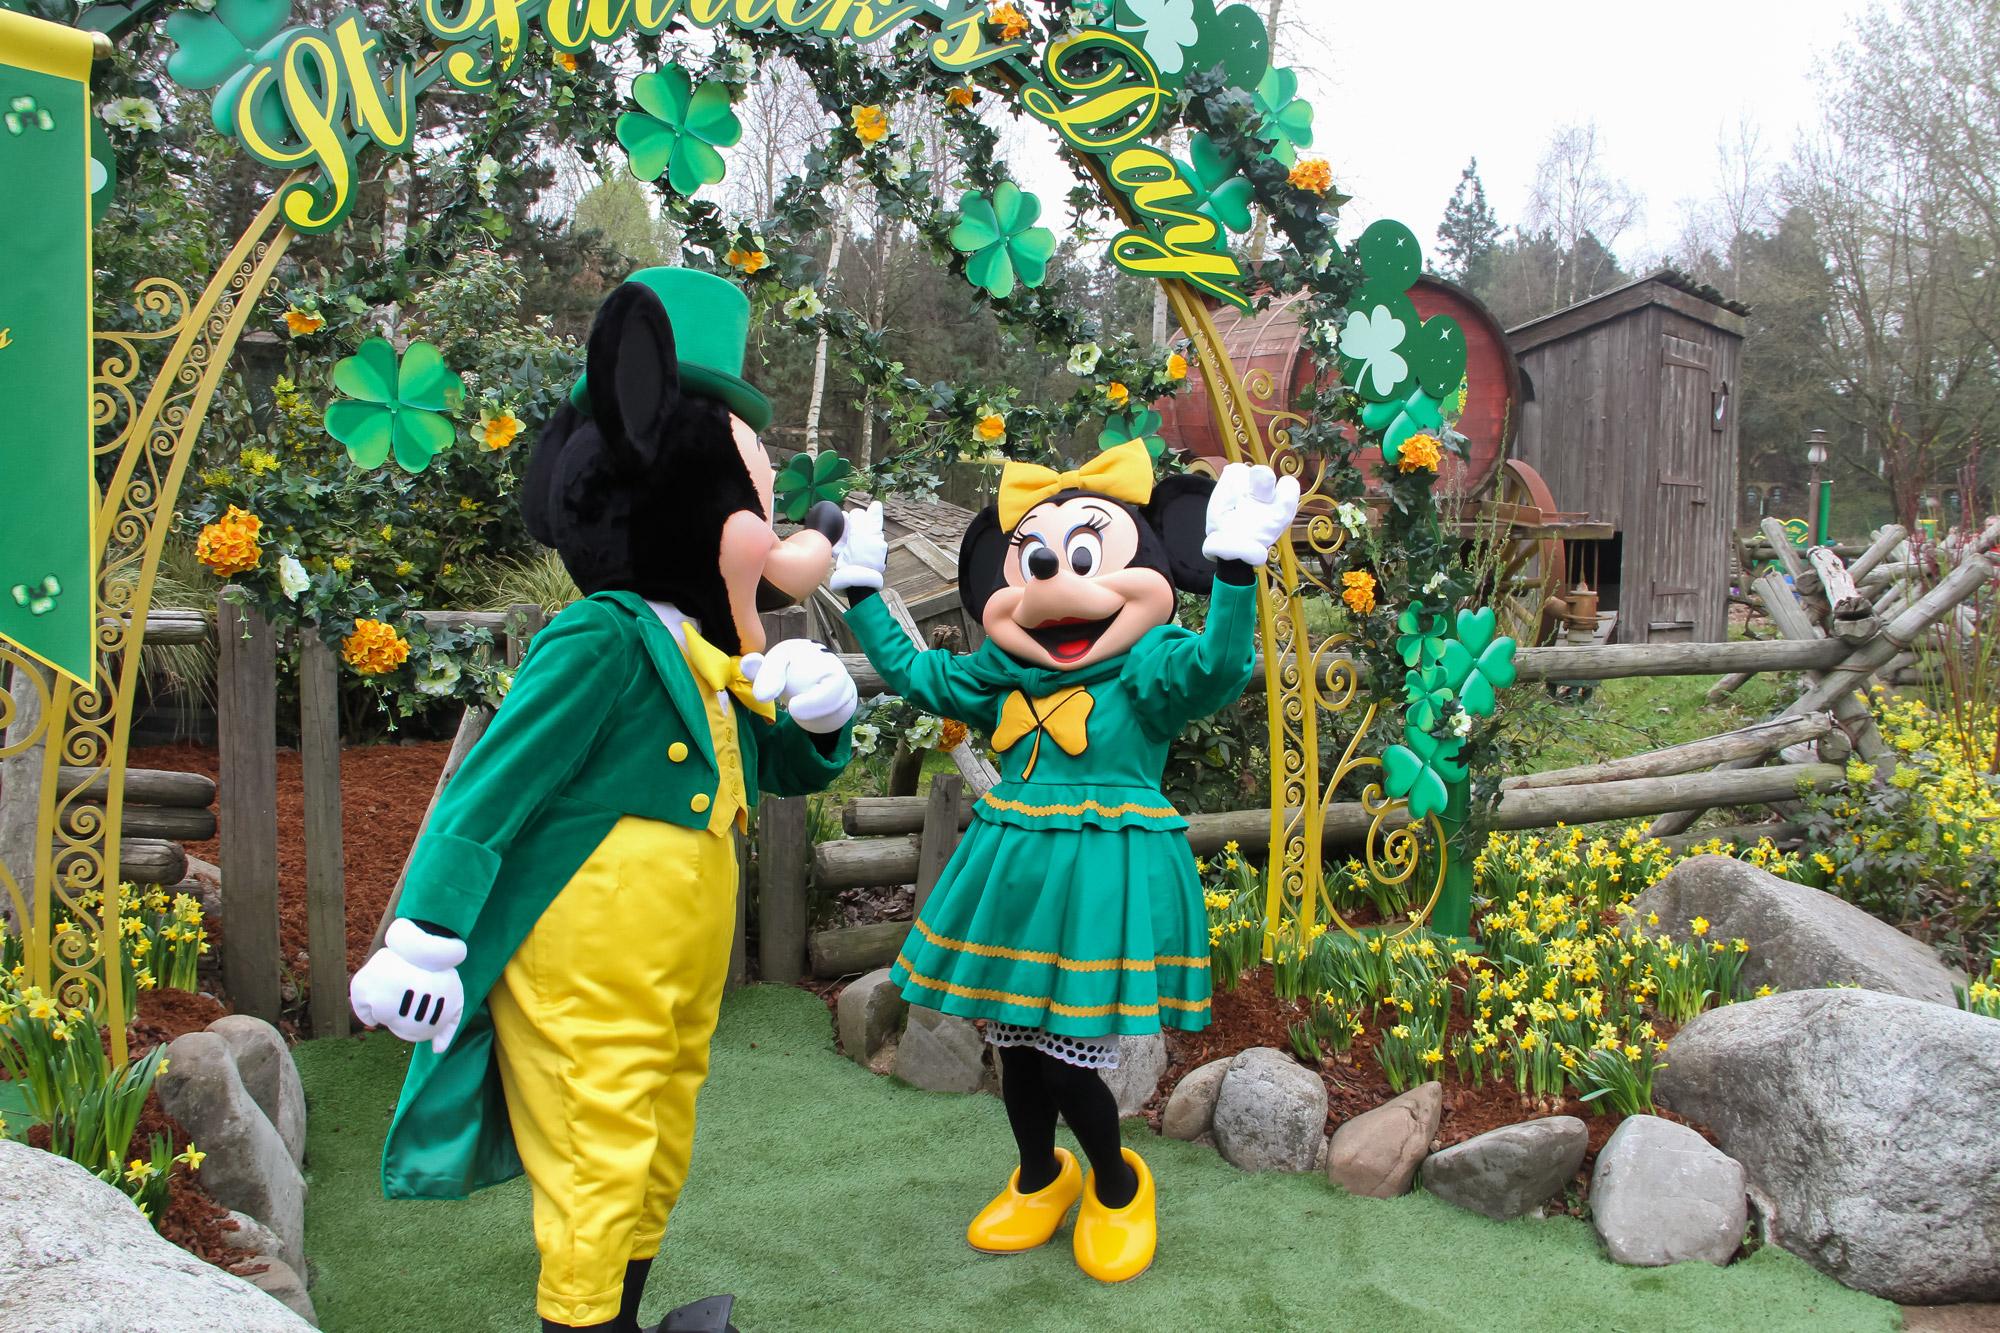 St-Patricks-Day-Celebrations-2014-Disney-Paris-overview-0008